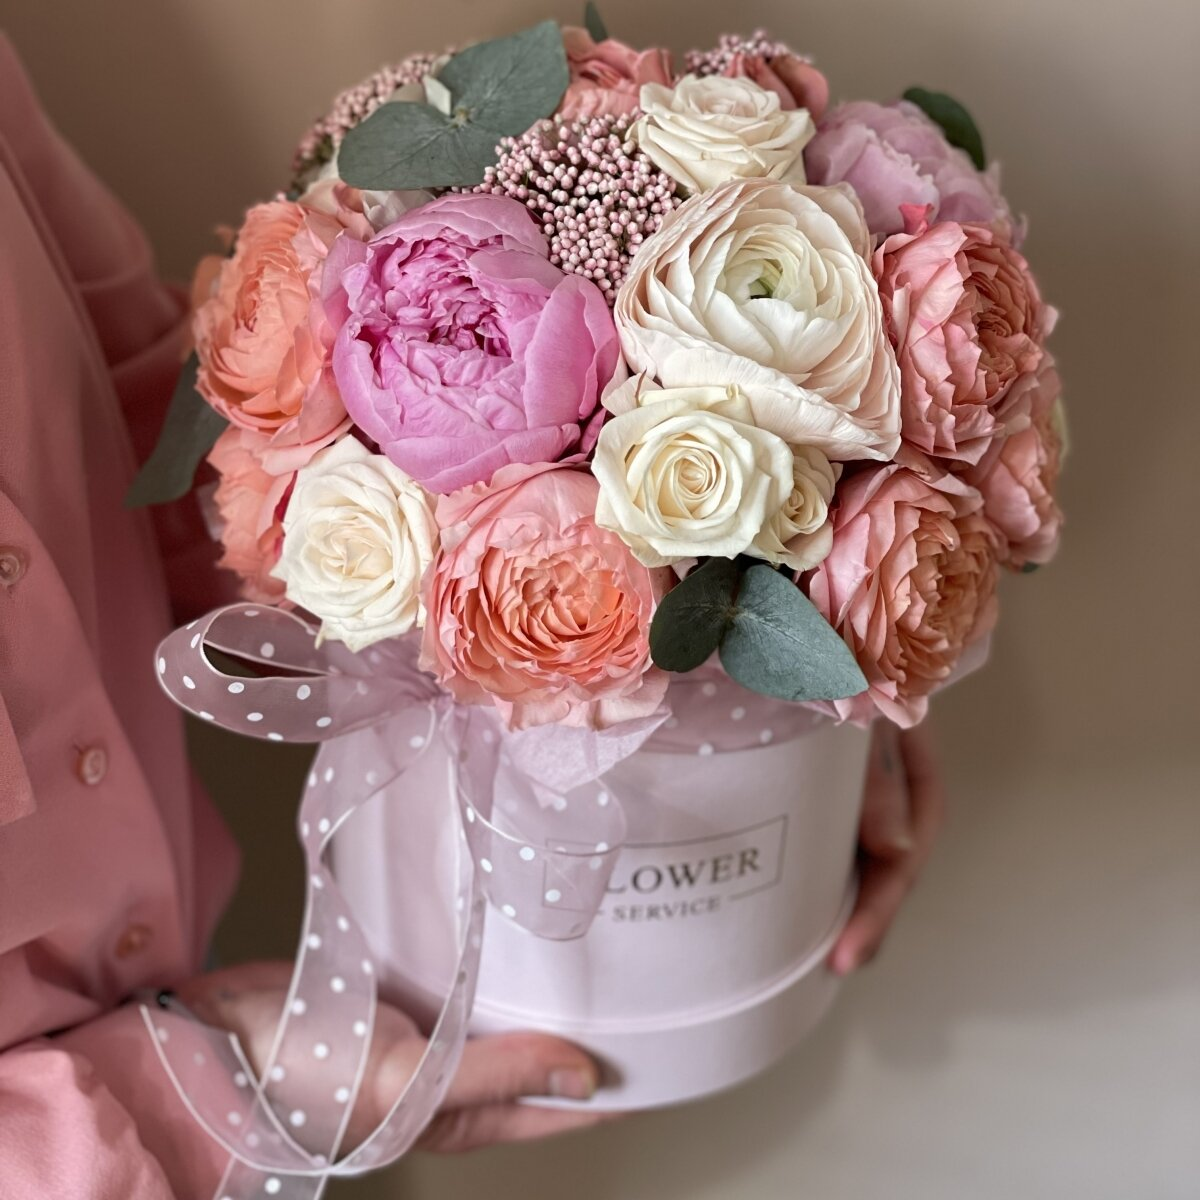 Коробка Симфония любви из пионов, ранункулюсов, озотамнуса и роз